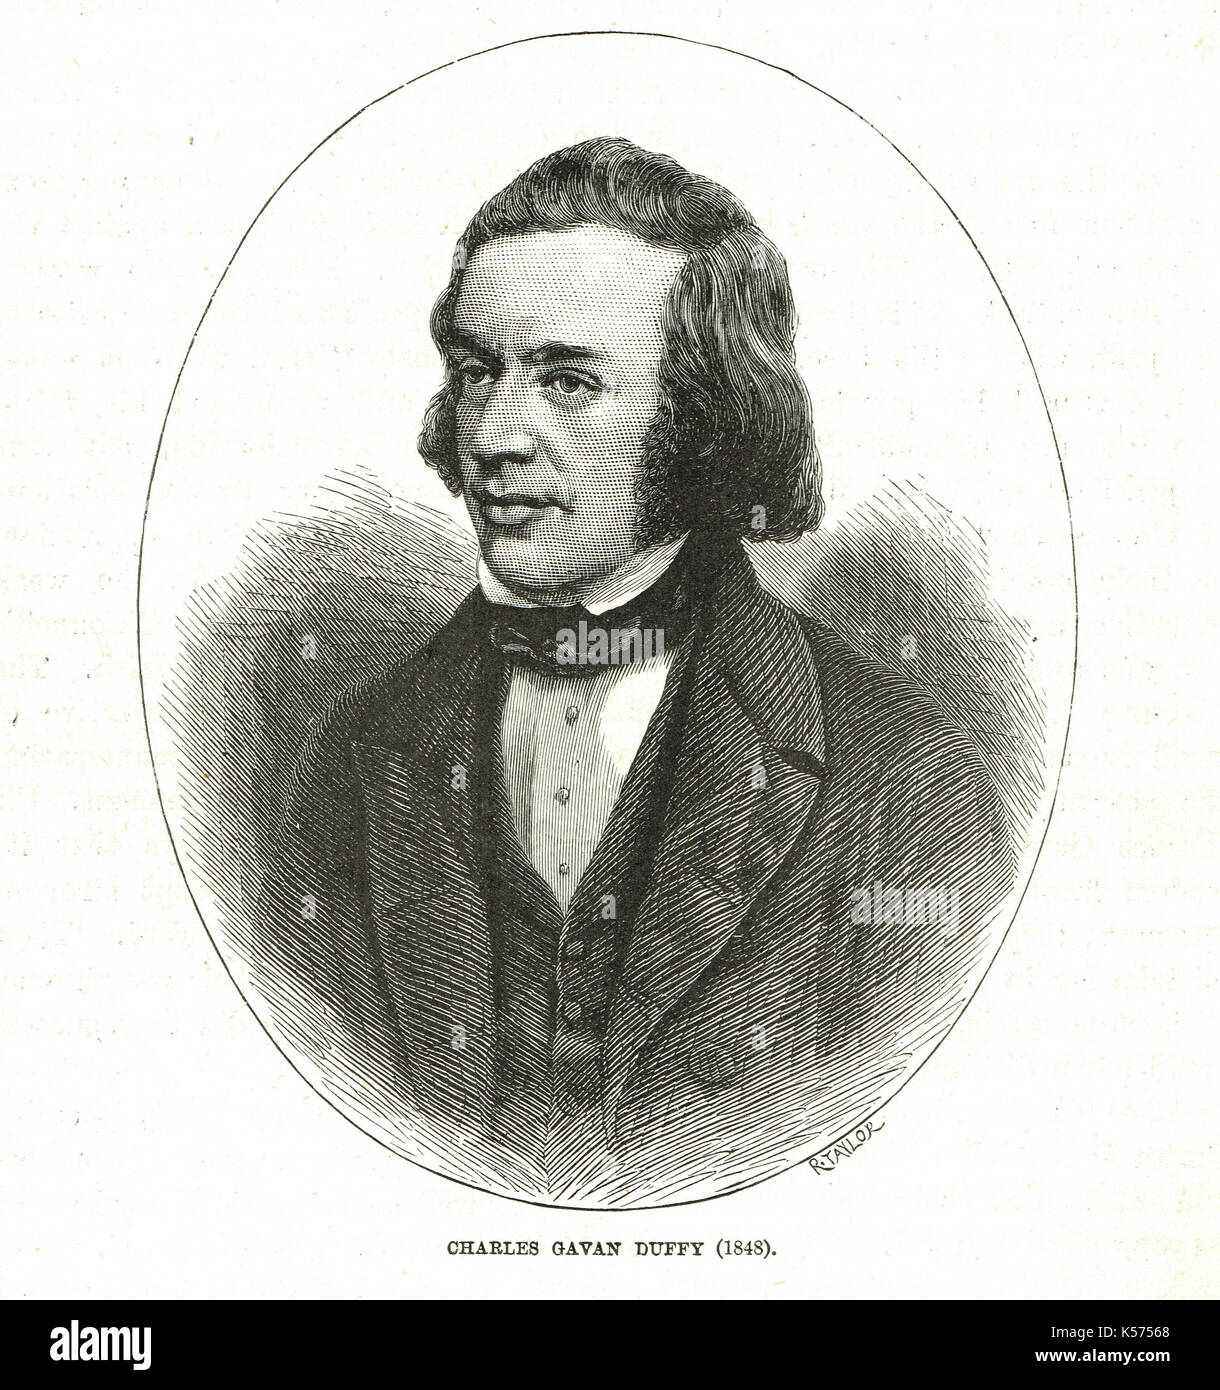 Charles Gavan Duffy 1816-1903, Irish radical & later Premier of Victoria  in Australia - Stock Image